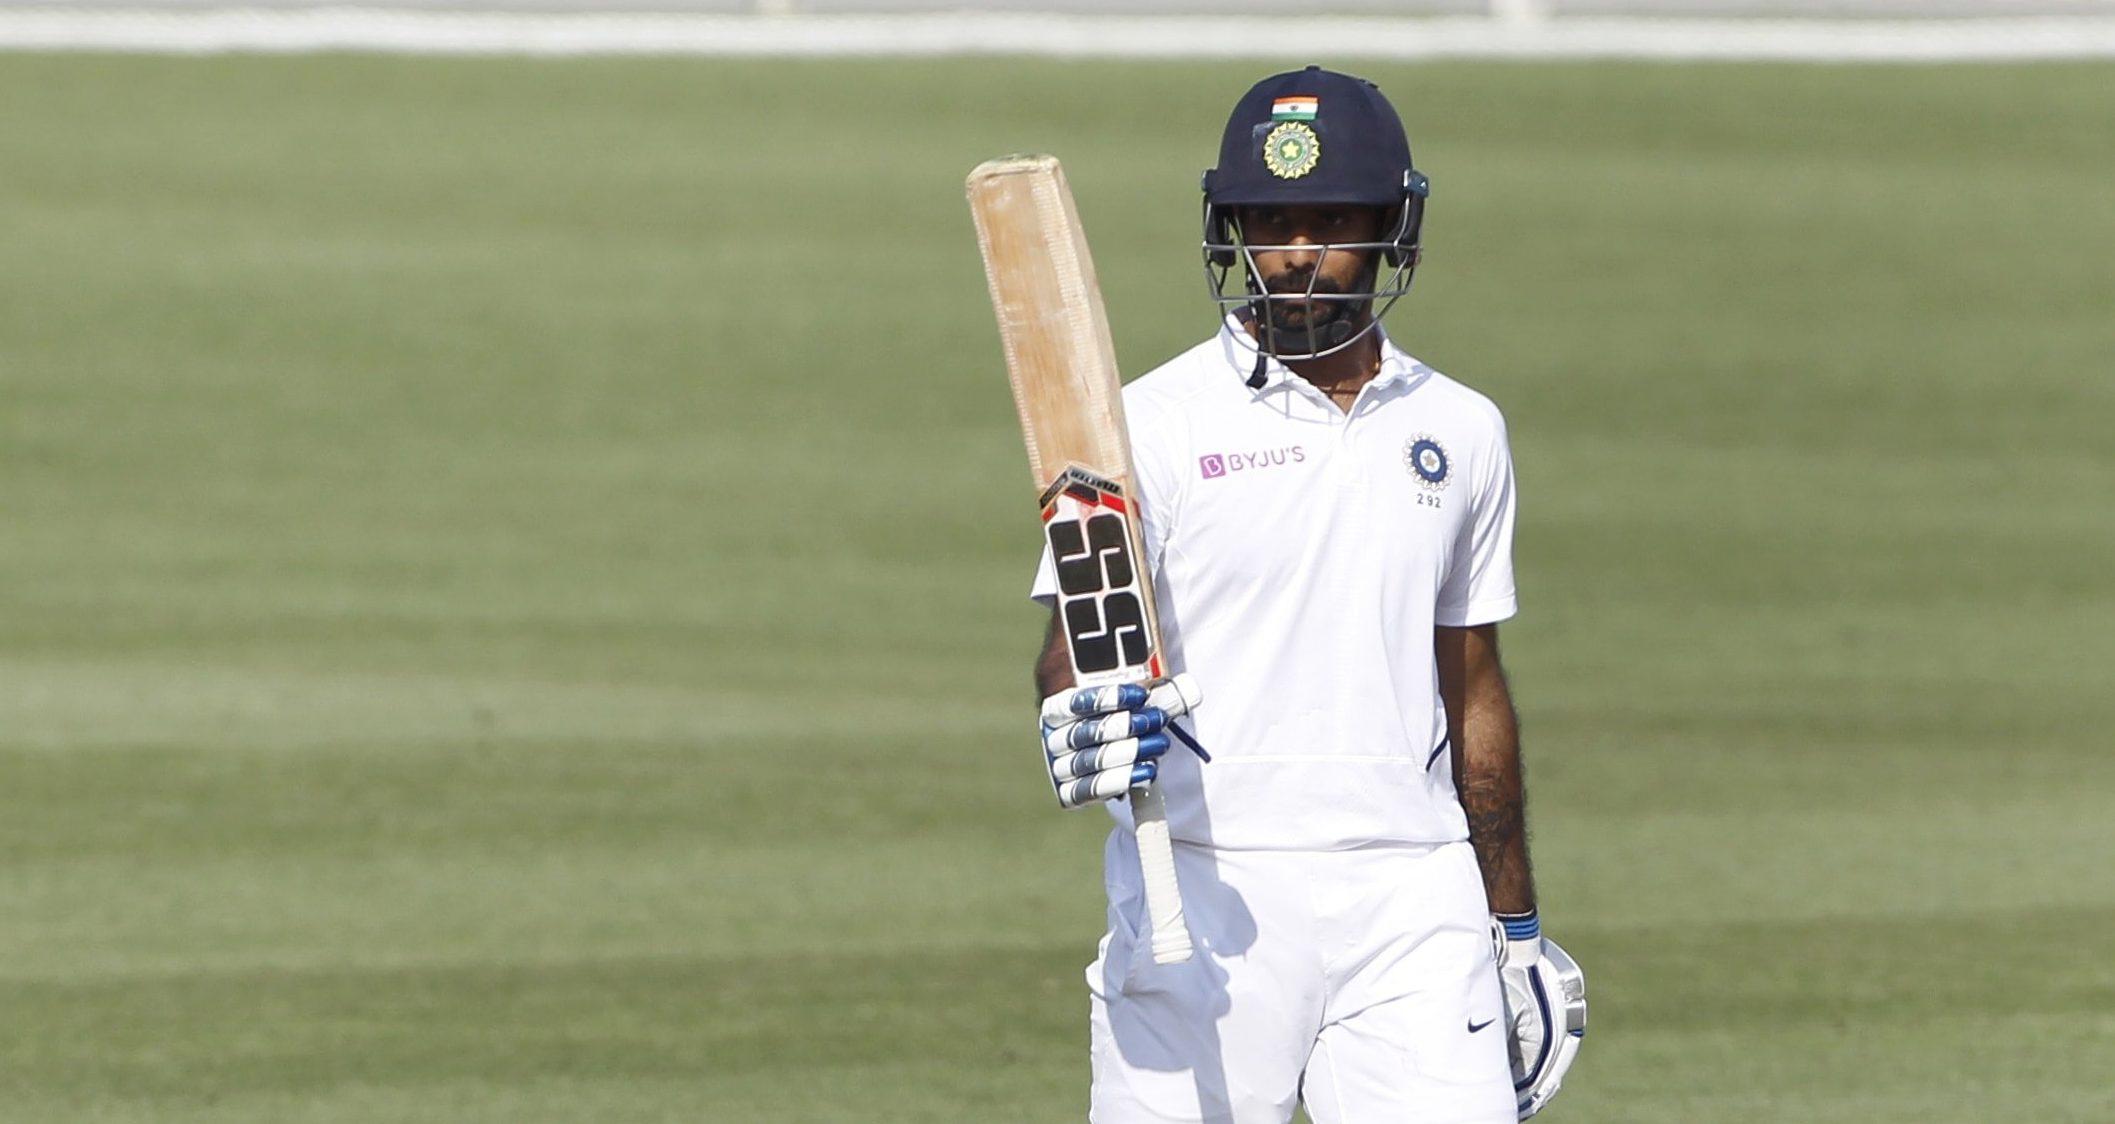 Time for Hanuma Vihari to rise once again - Cricket News